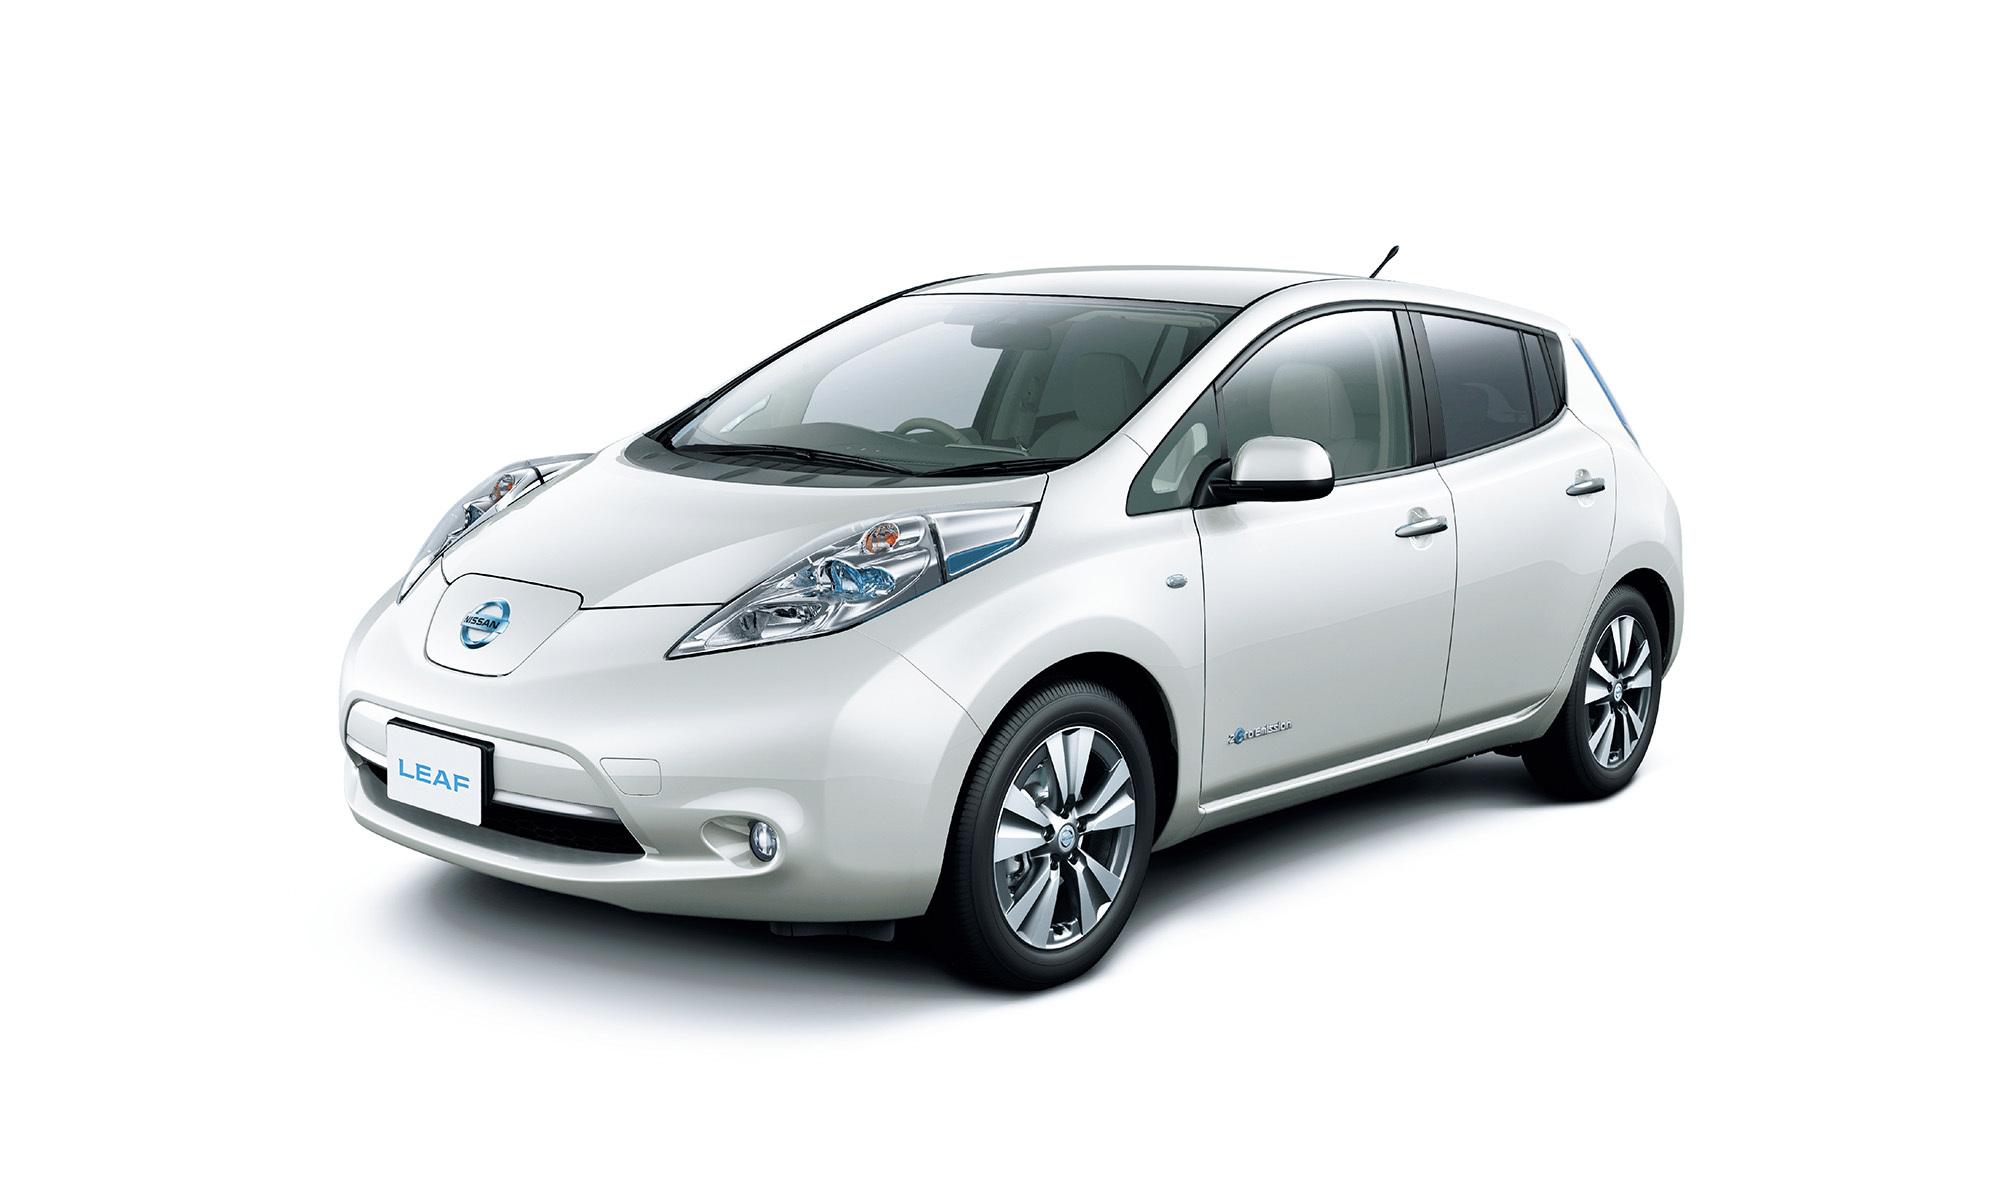 Nissan LEAF 24kWh (2011)